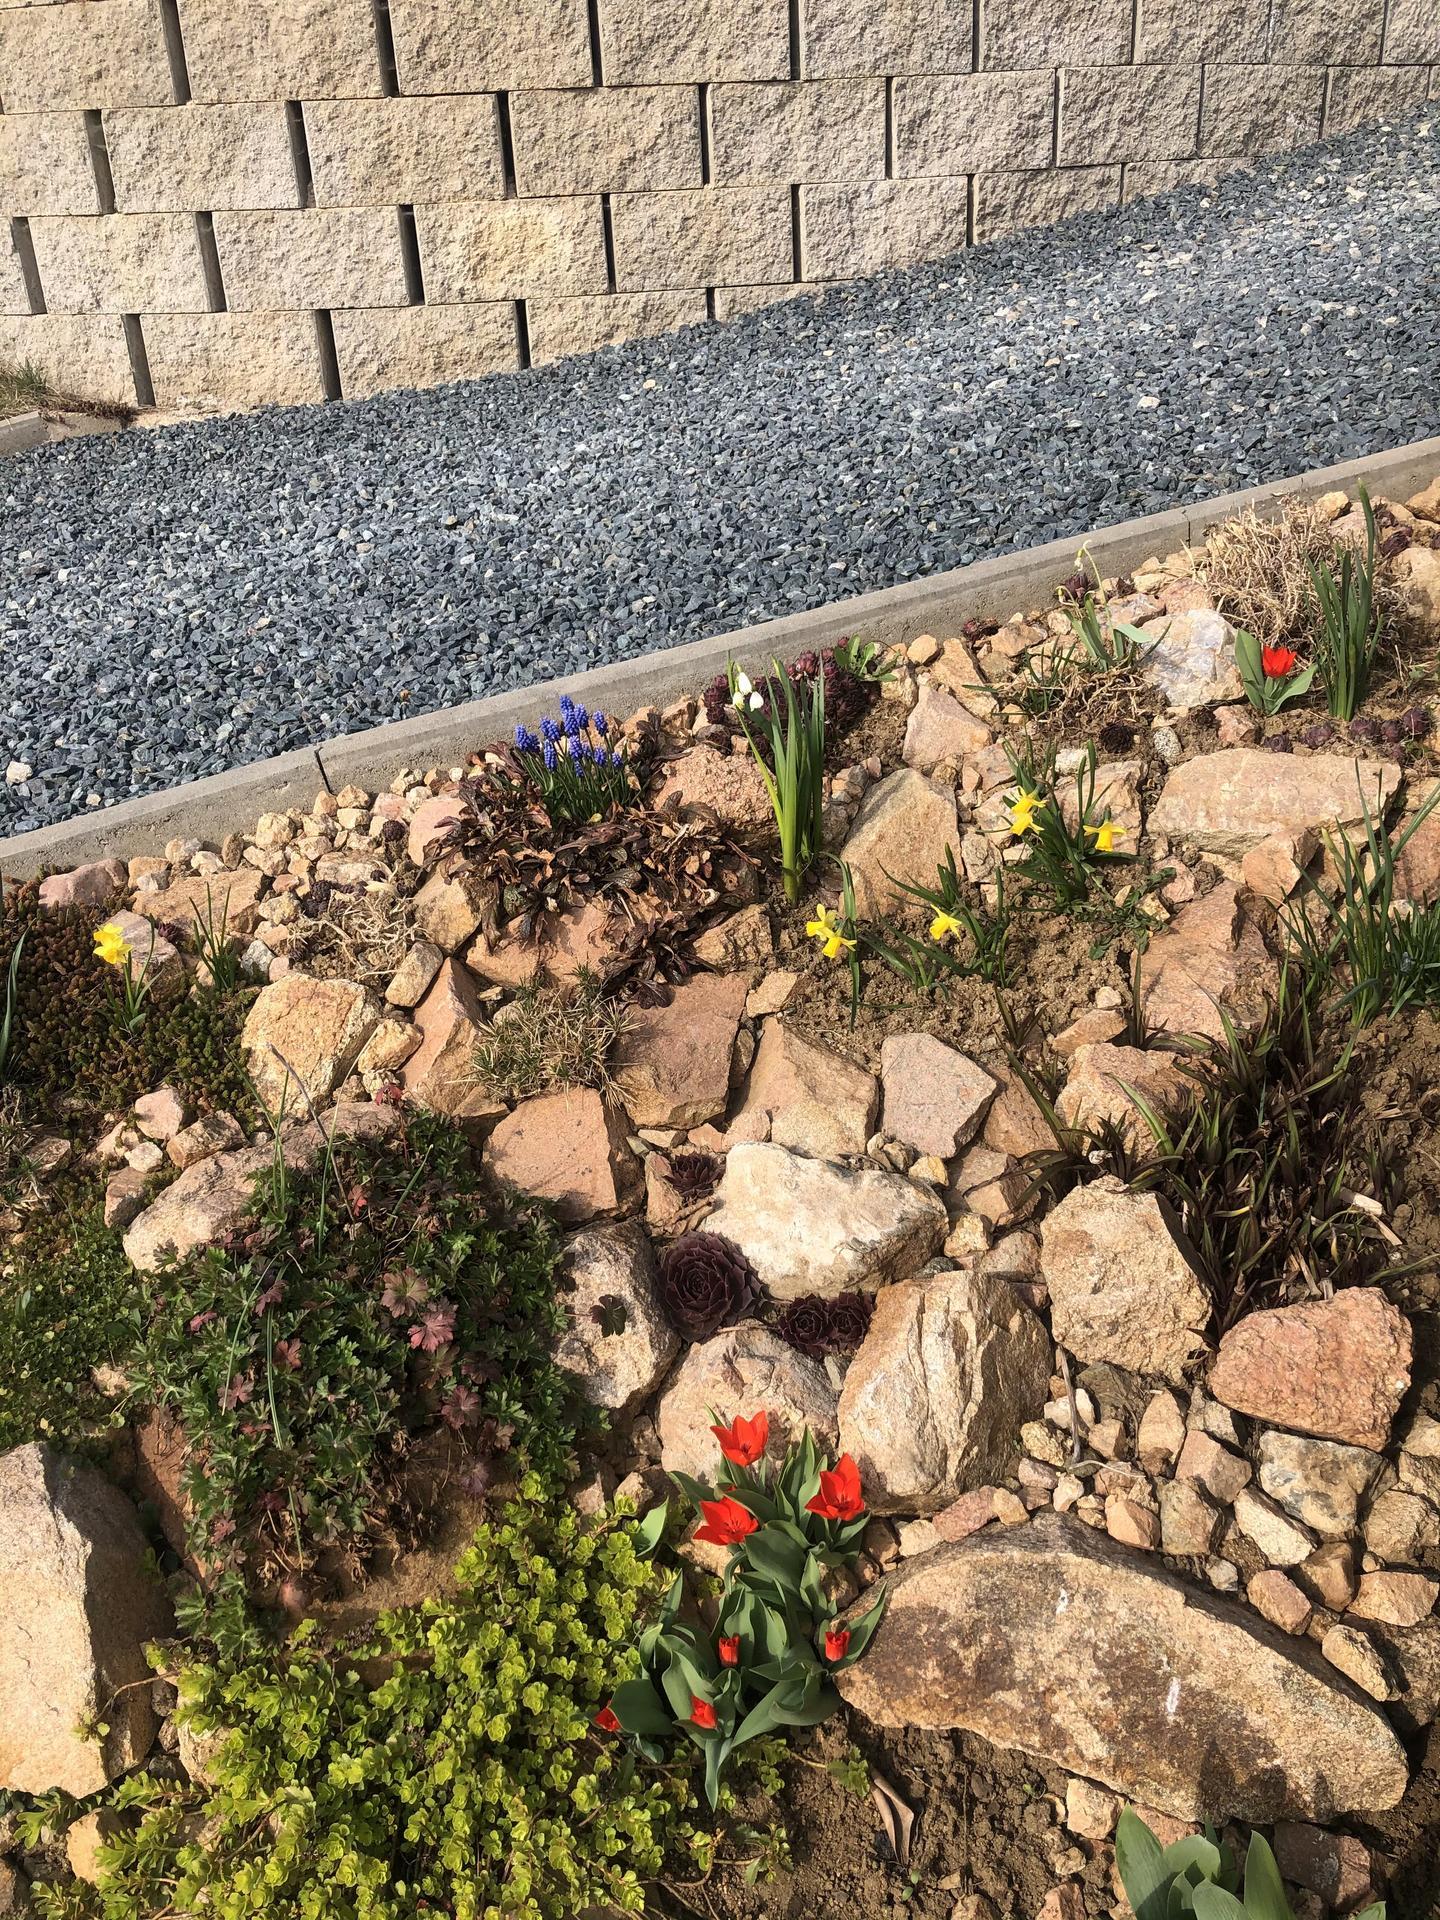 Skřítčí zahrada 2021 - Duben 2021 - květinová skalka